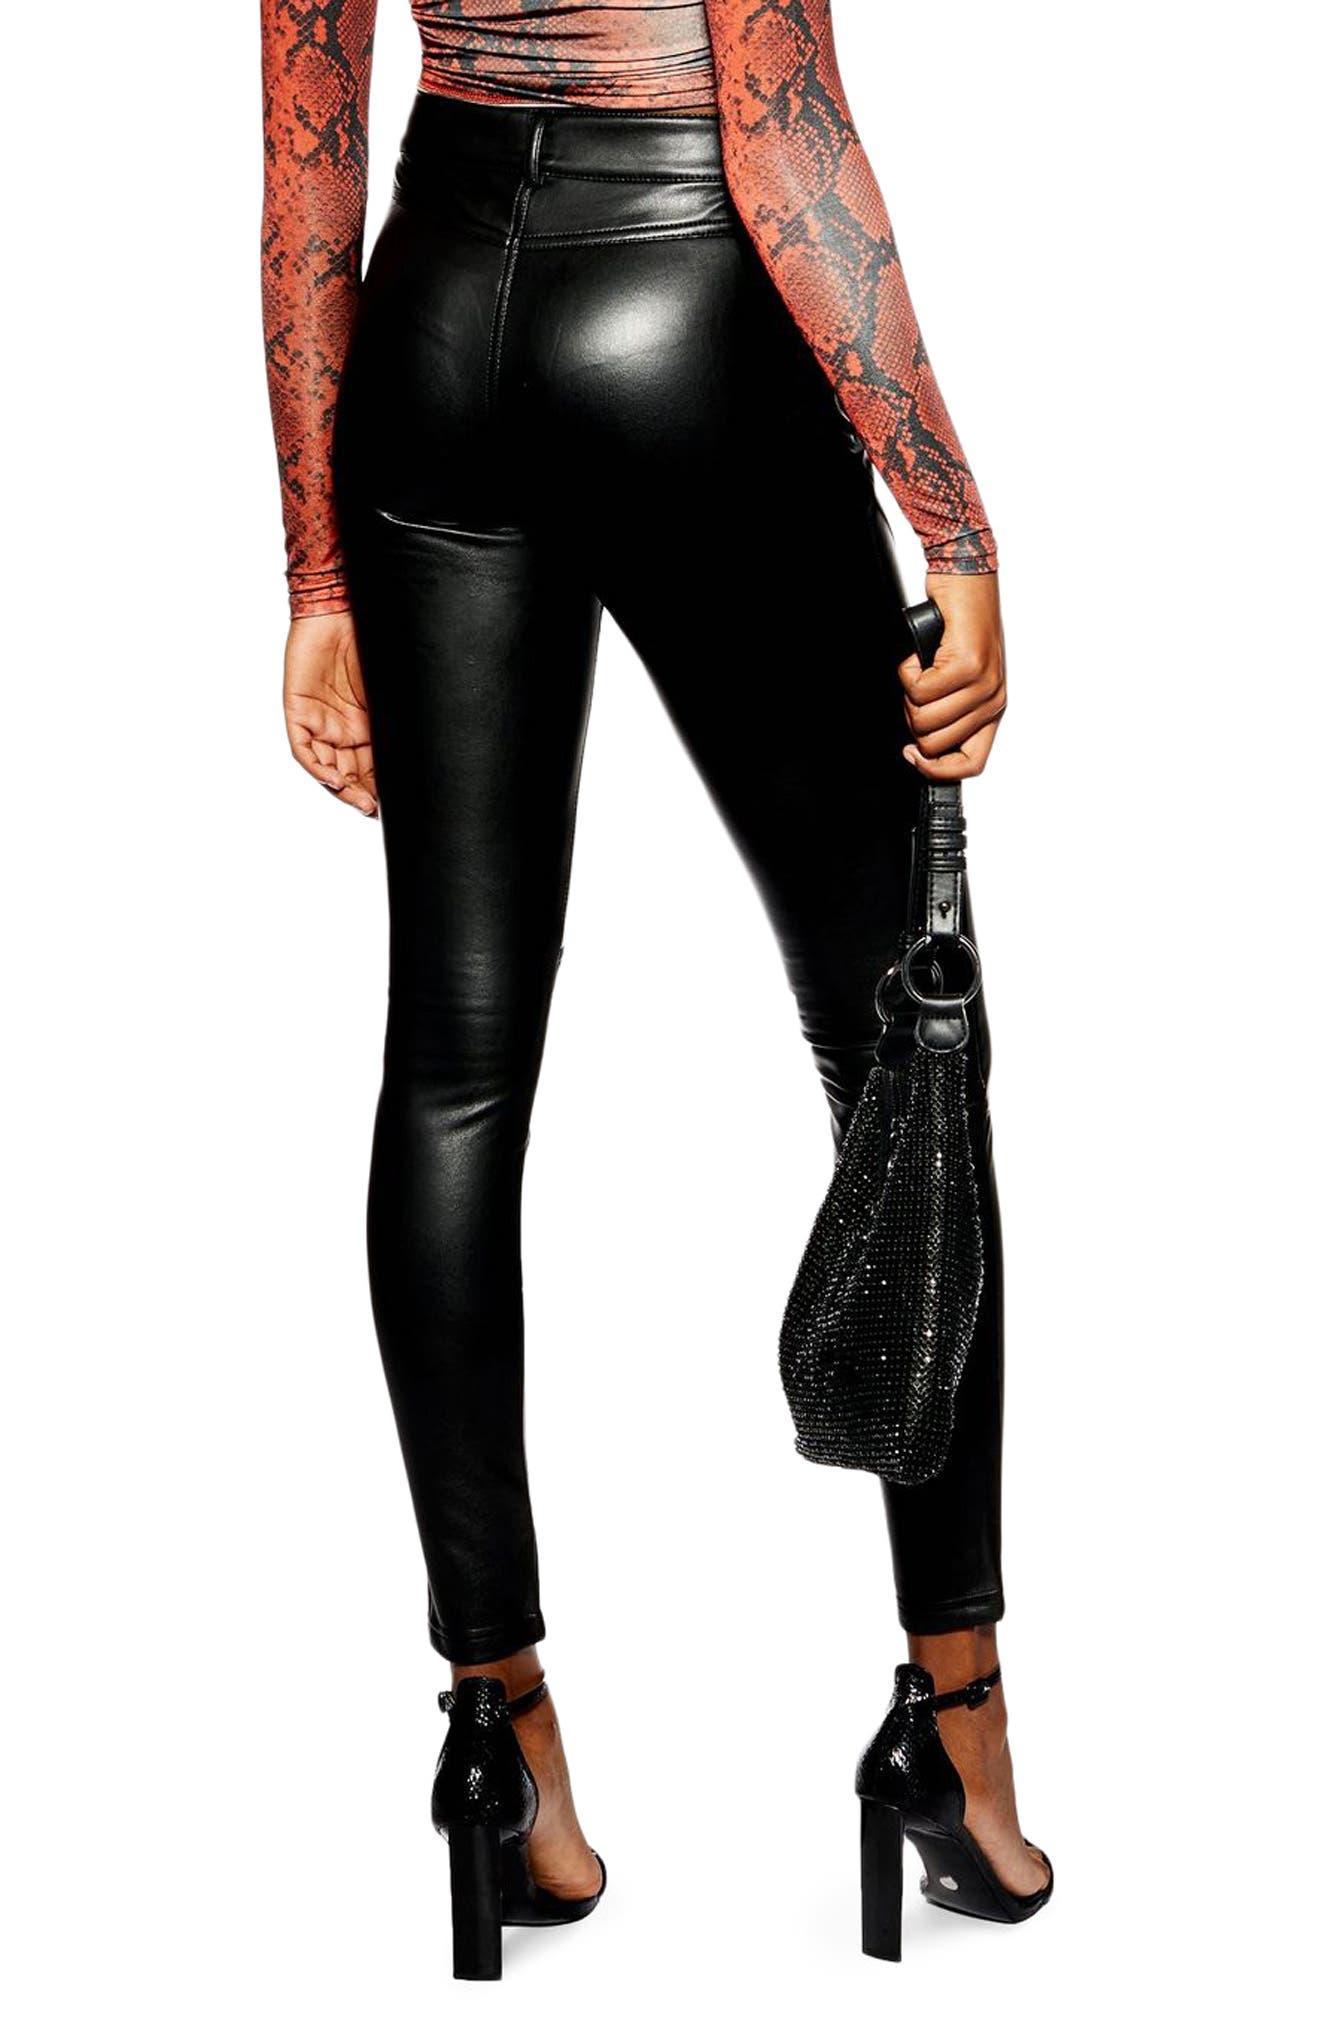 TOPSHOP, Faux Leather Skinny Biker Pants, Alternate thumbnail 2, color, BLACK